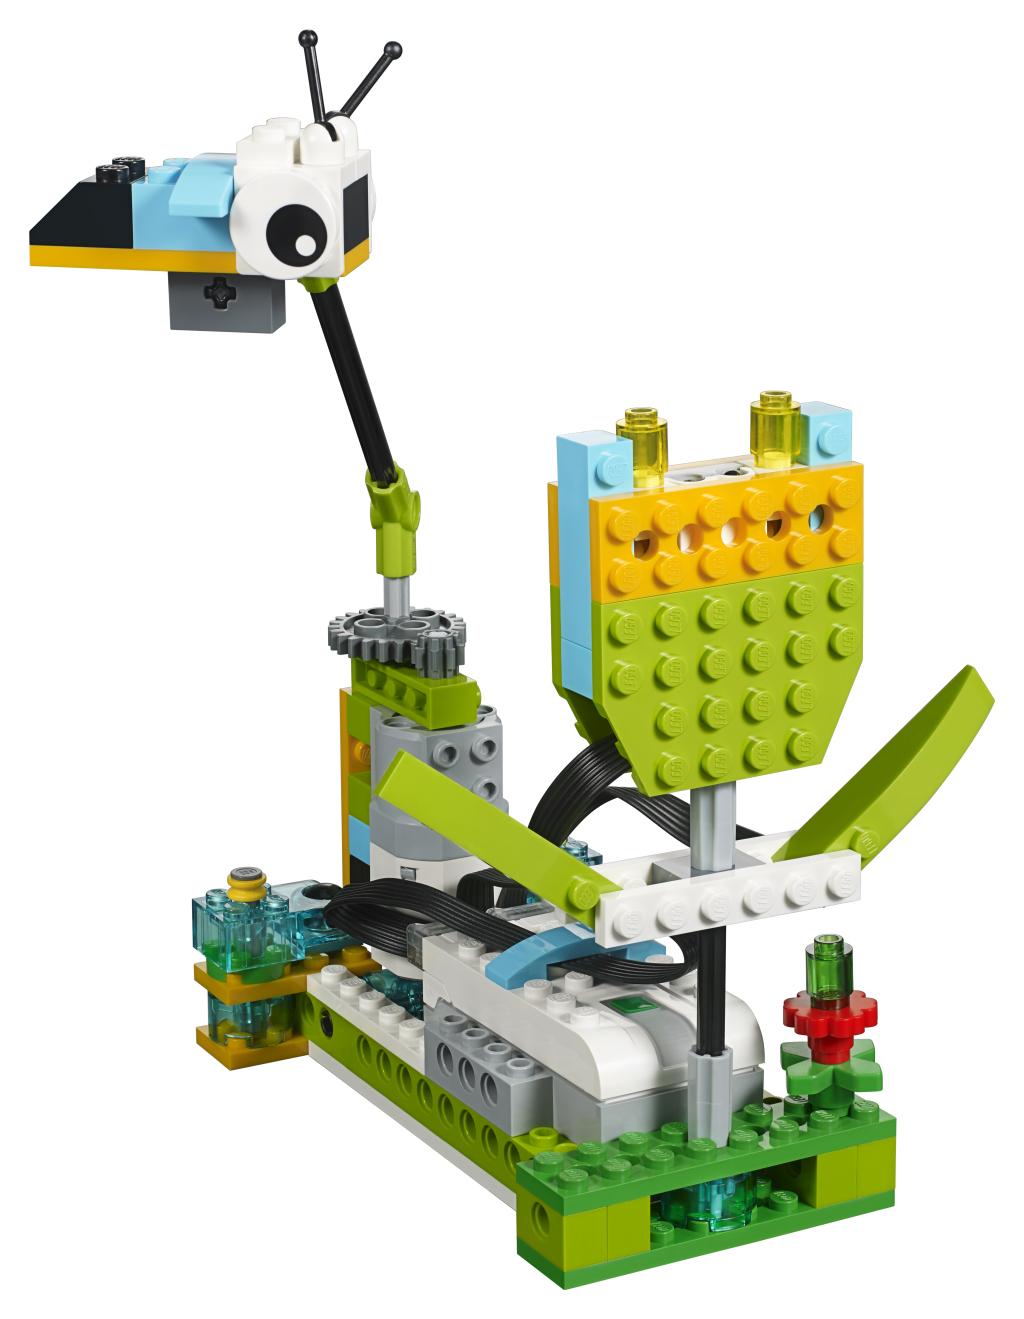 CES 2016: LEGO's WeDo 2.0 Robotics Kit